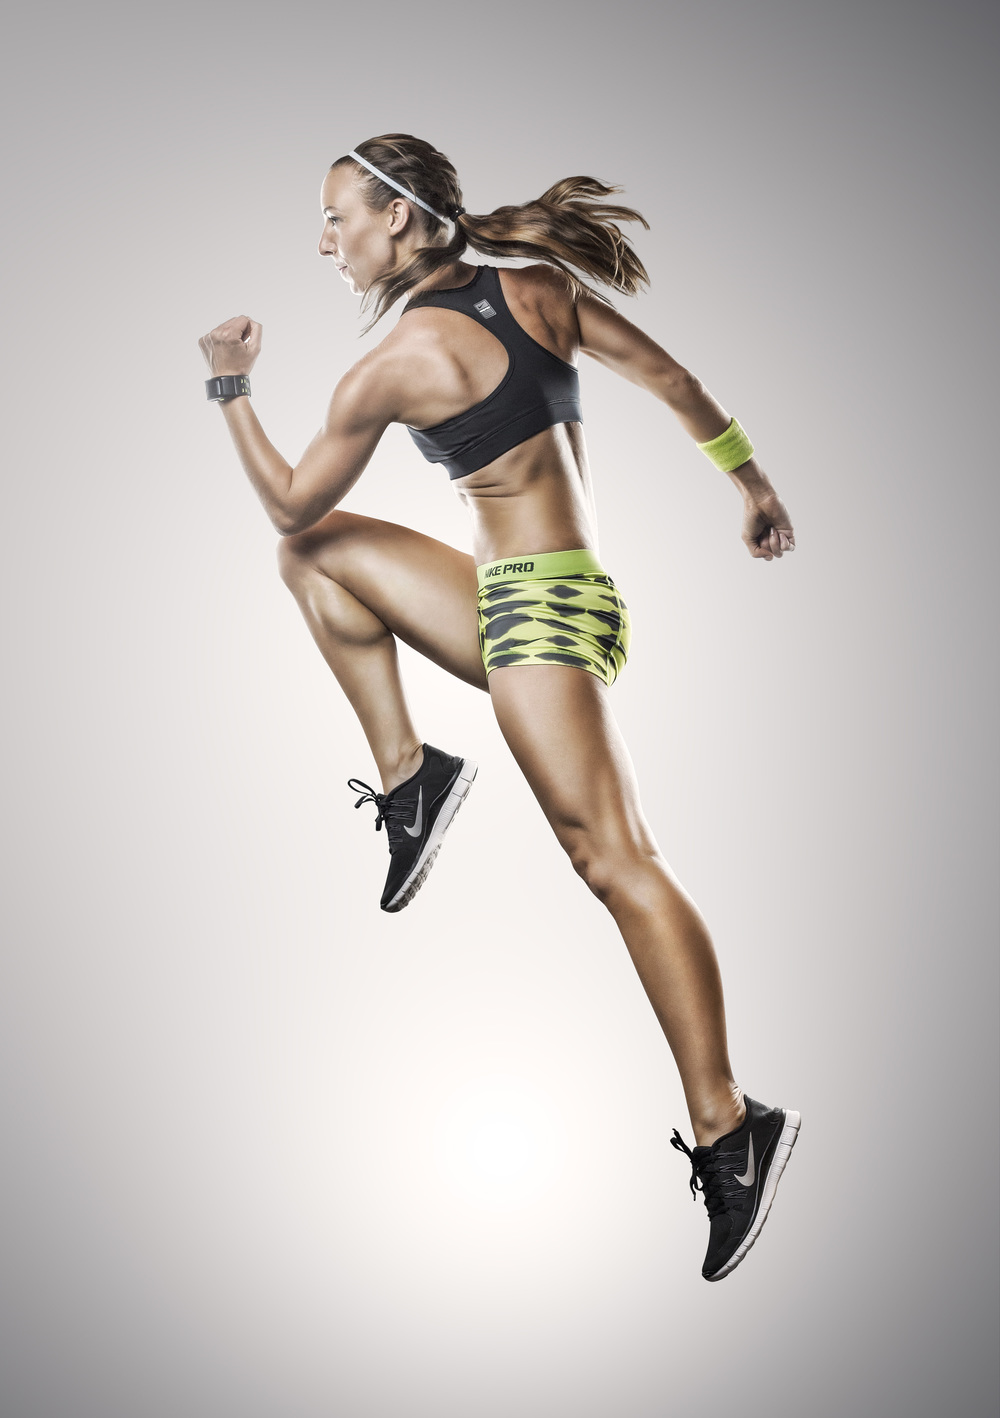 Samia_Nike-125.jpg